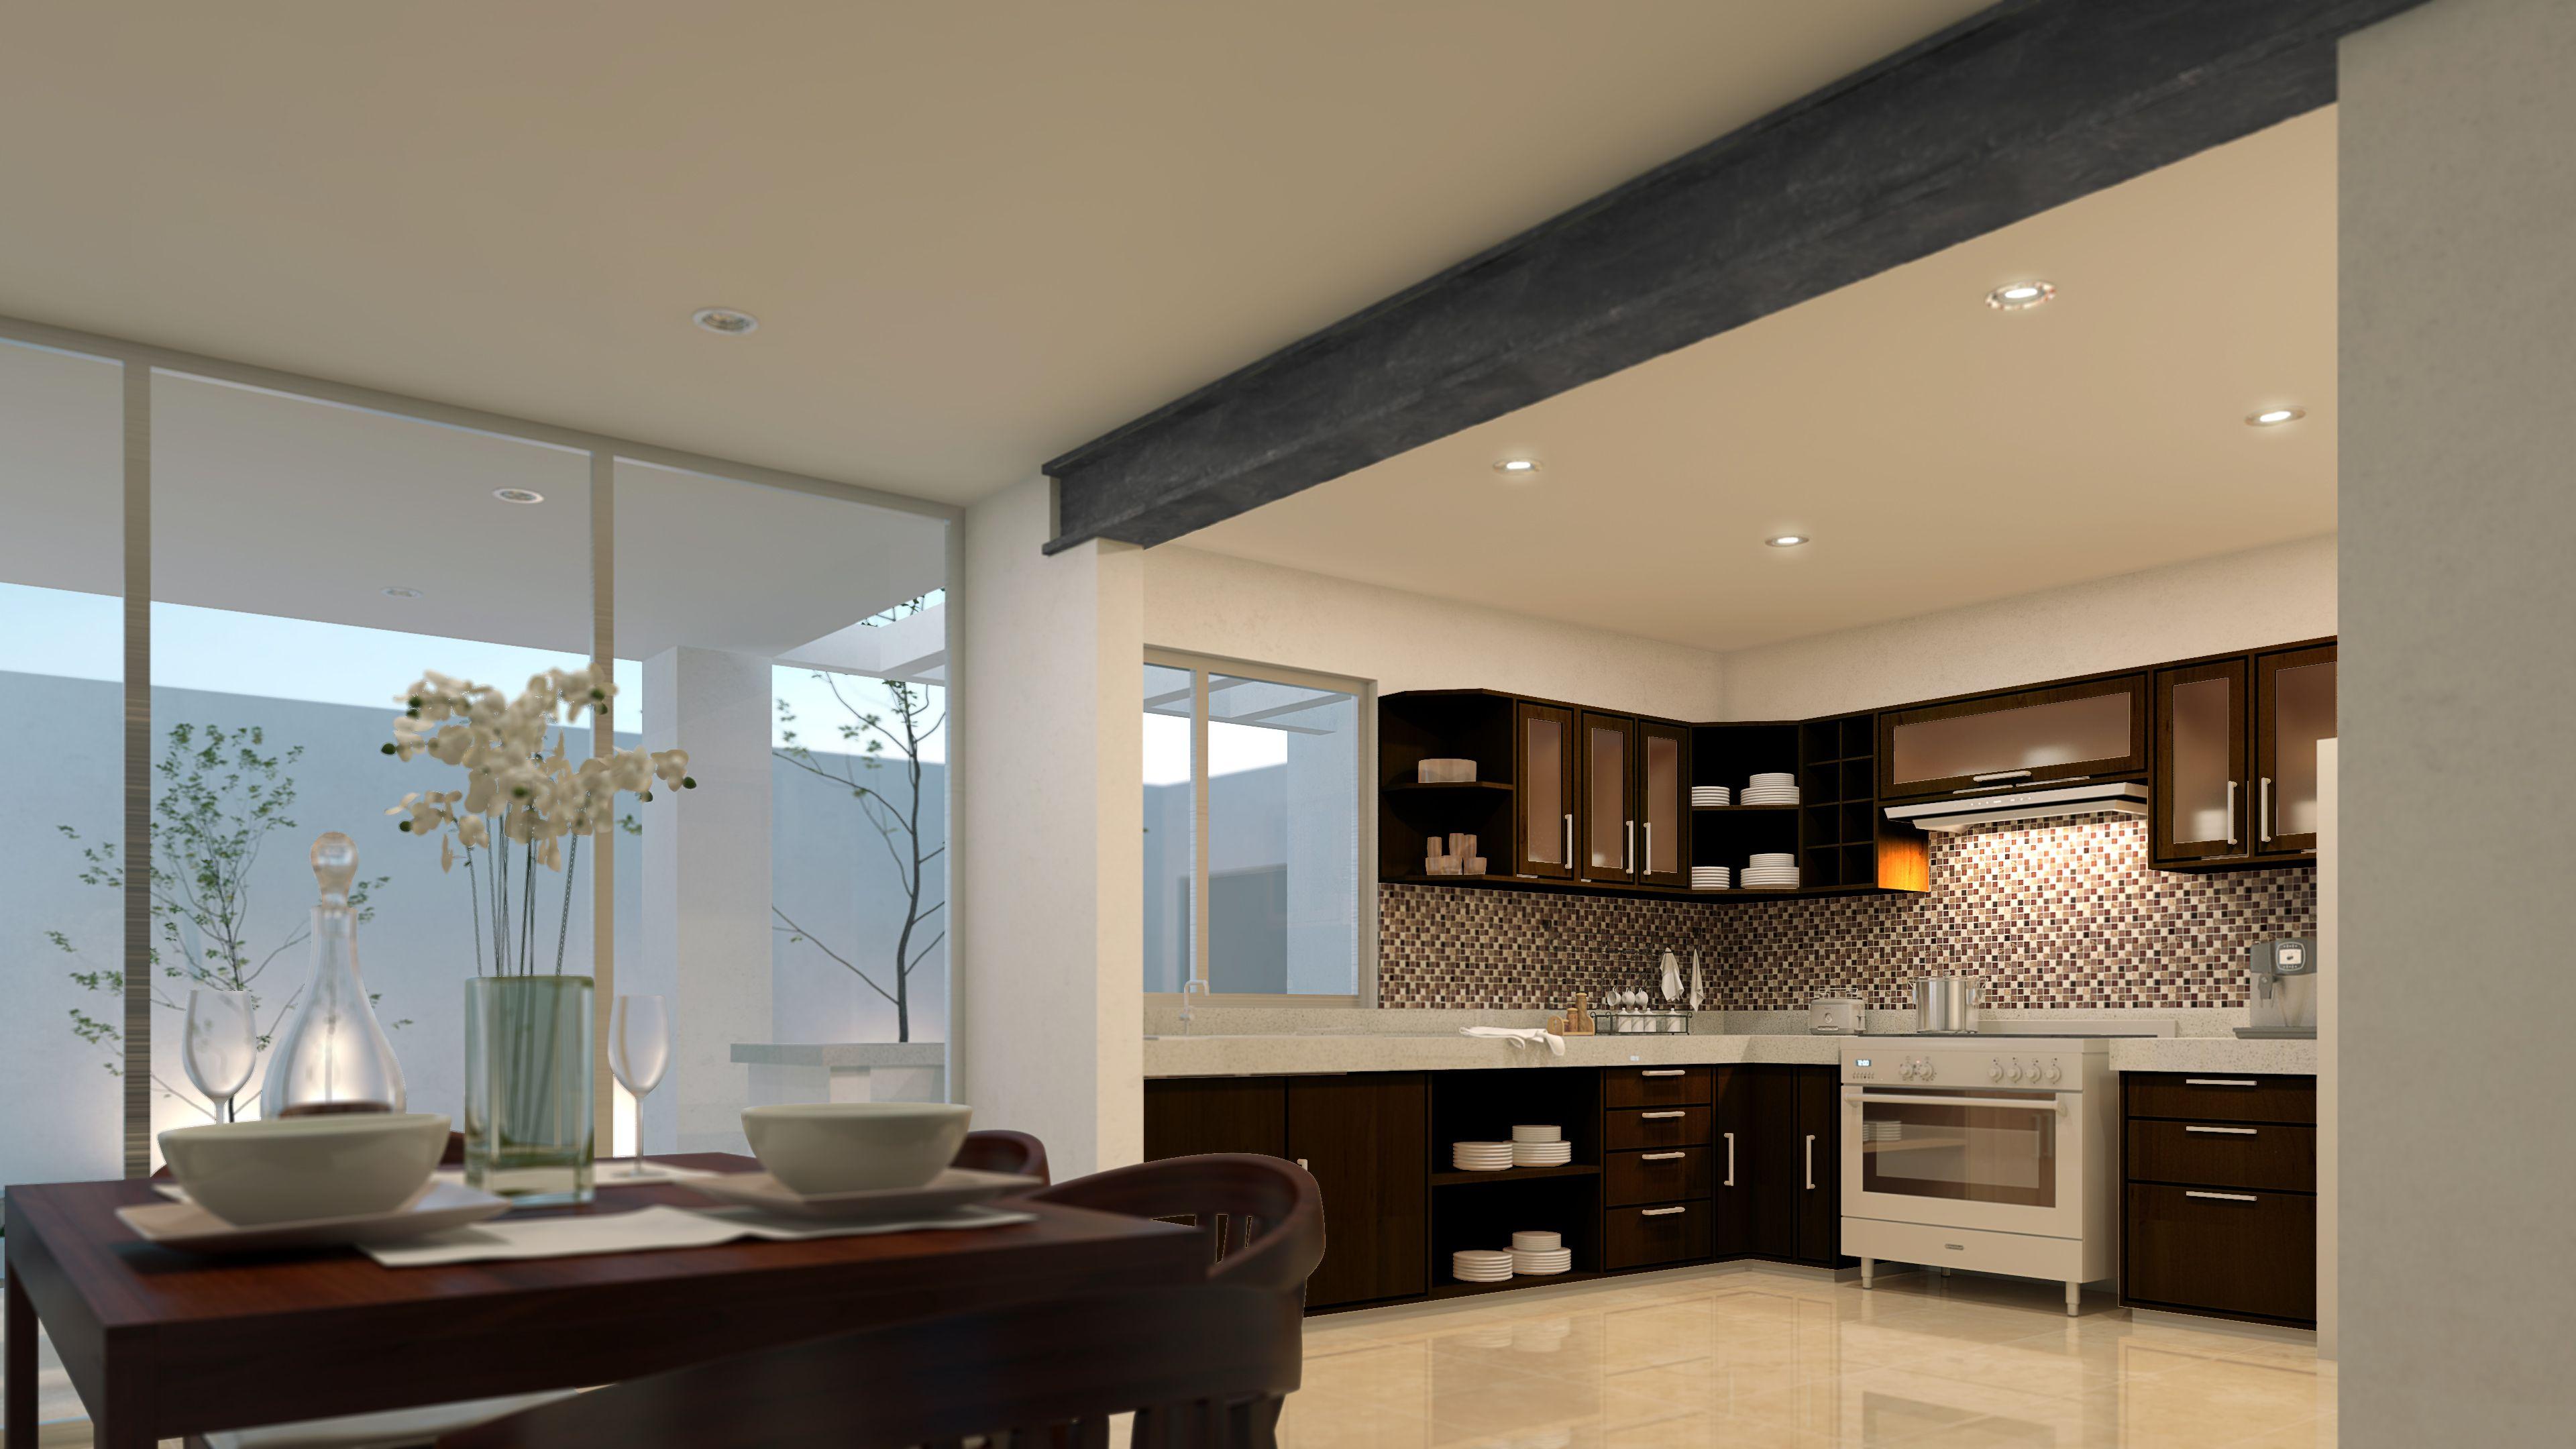 Cocina abierta a comedor | Diseño de Interiores | Pinterest ...